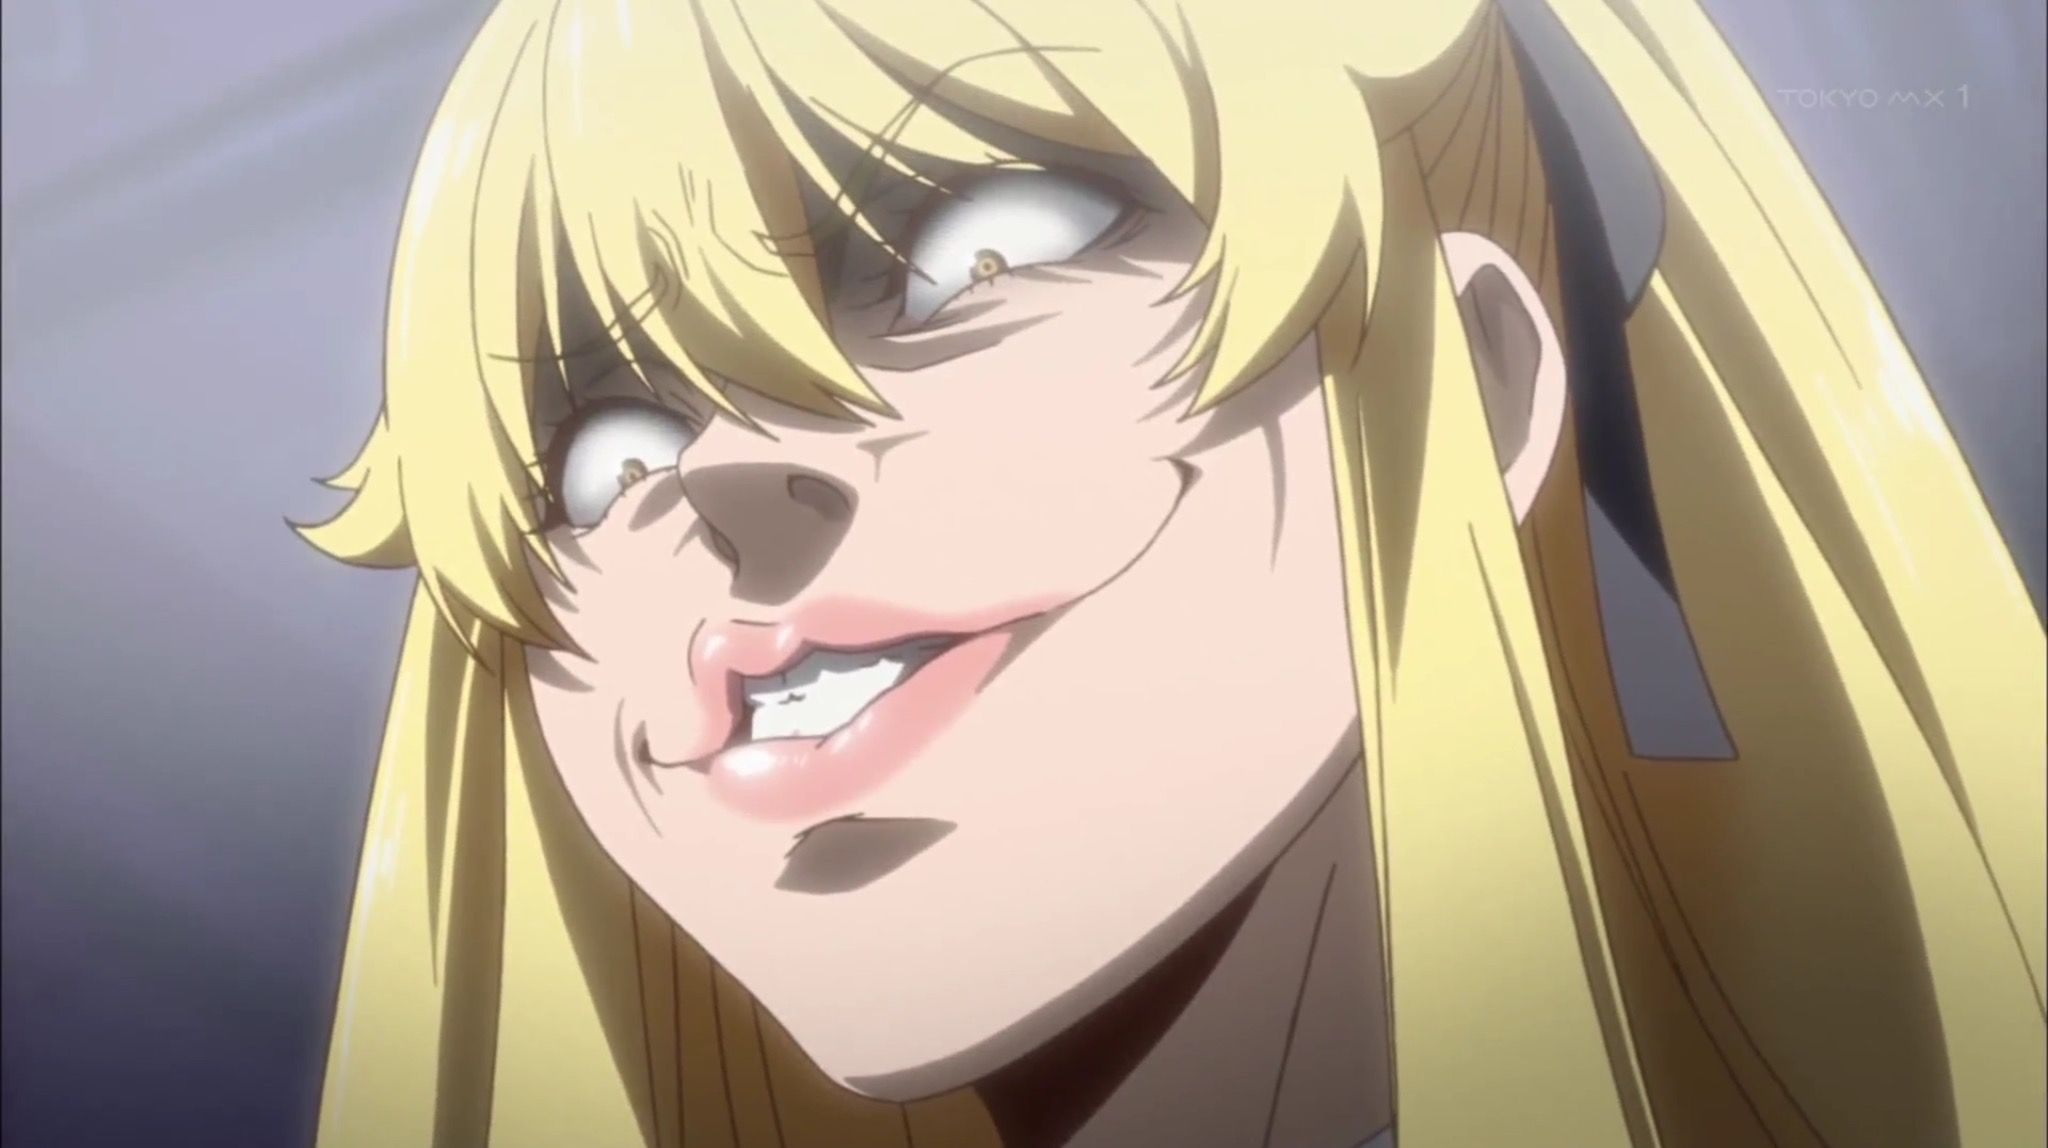 Almost Looks Like A Victory Face Of Saotome Kakegurui